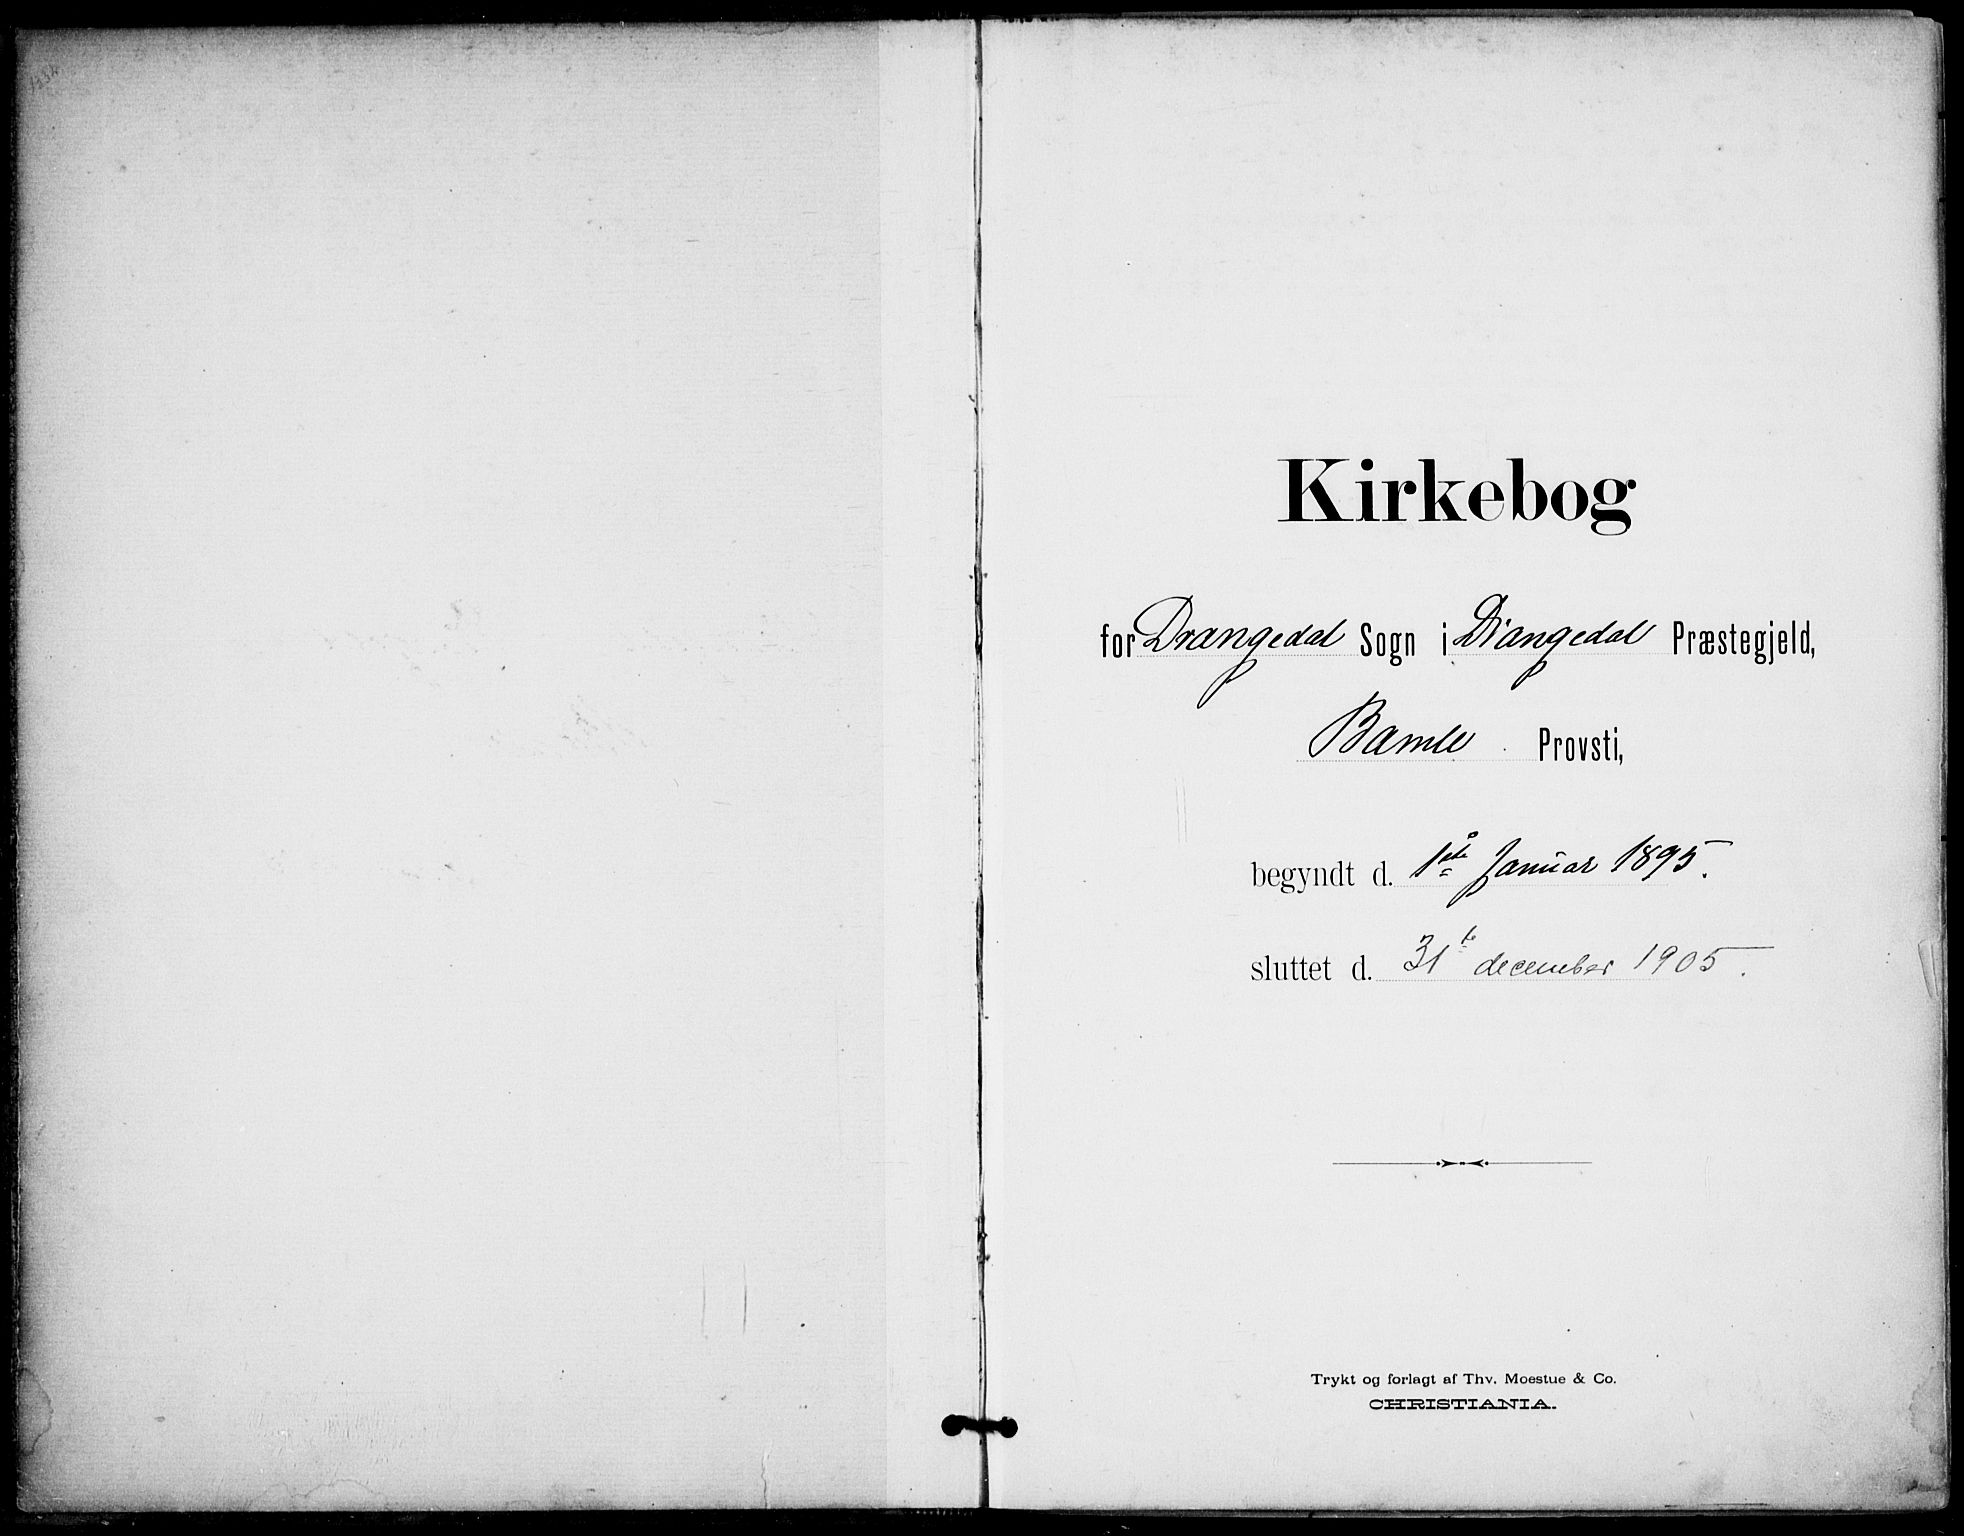 SAKO, Drangedal kirkebøker, F/Fa/L0012: Ministerialbok nr. 12, 1895-1905